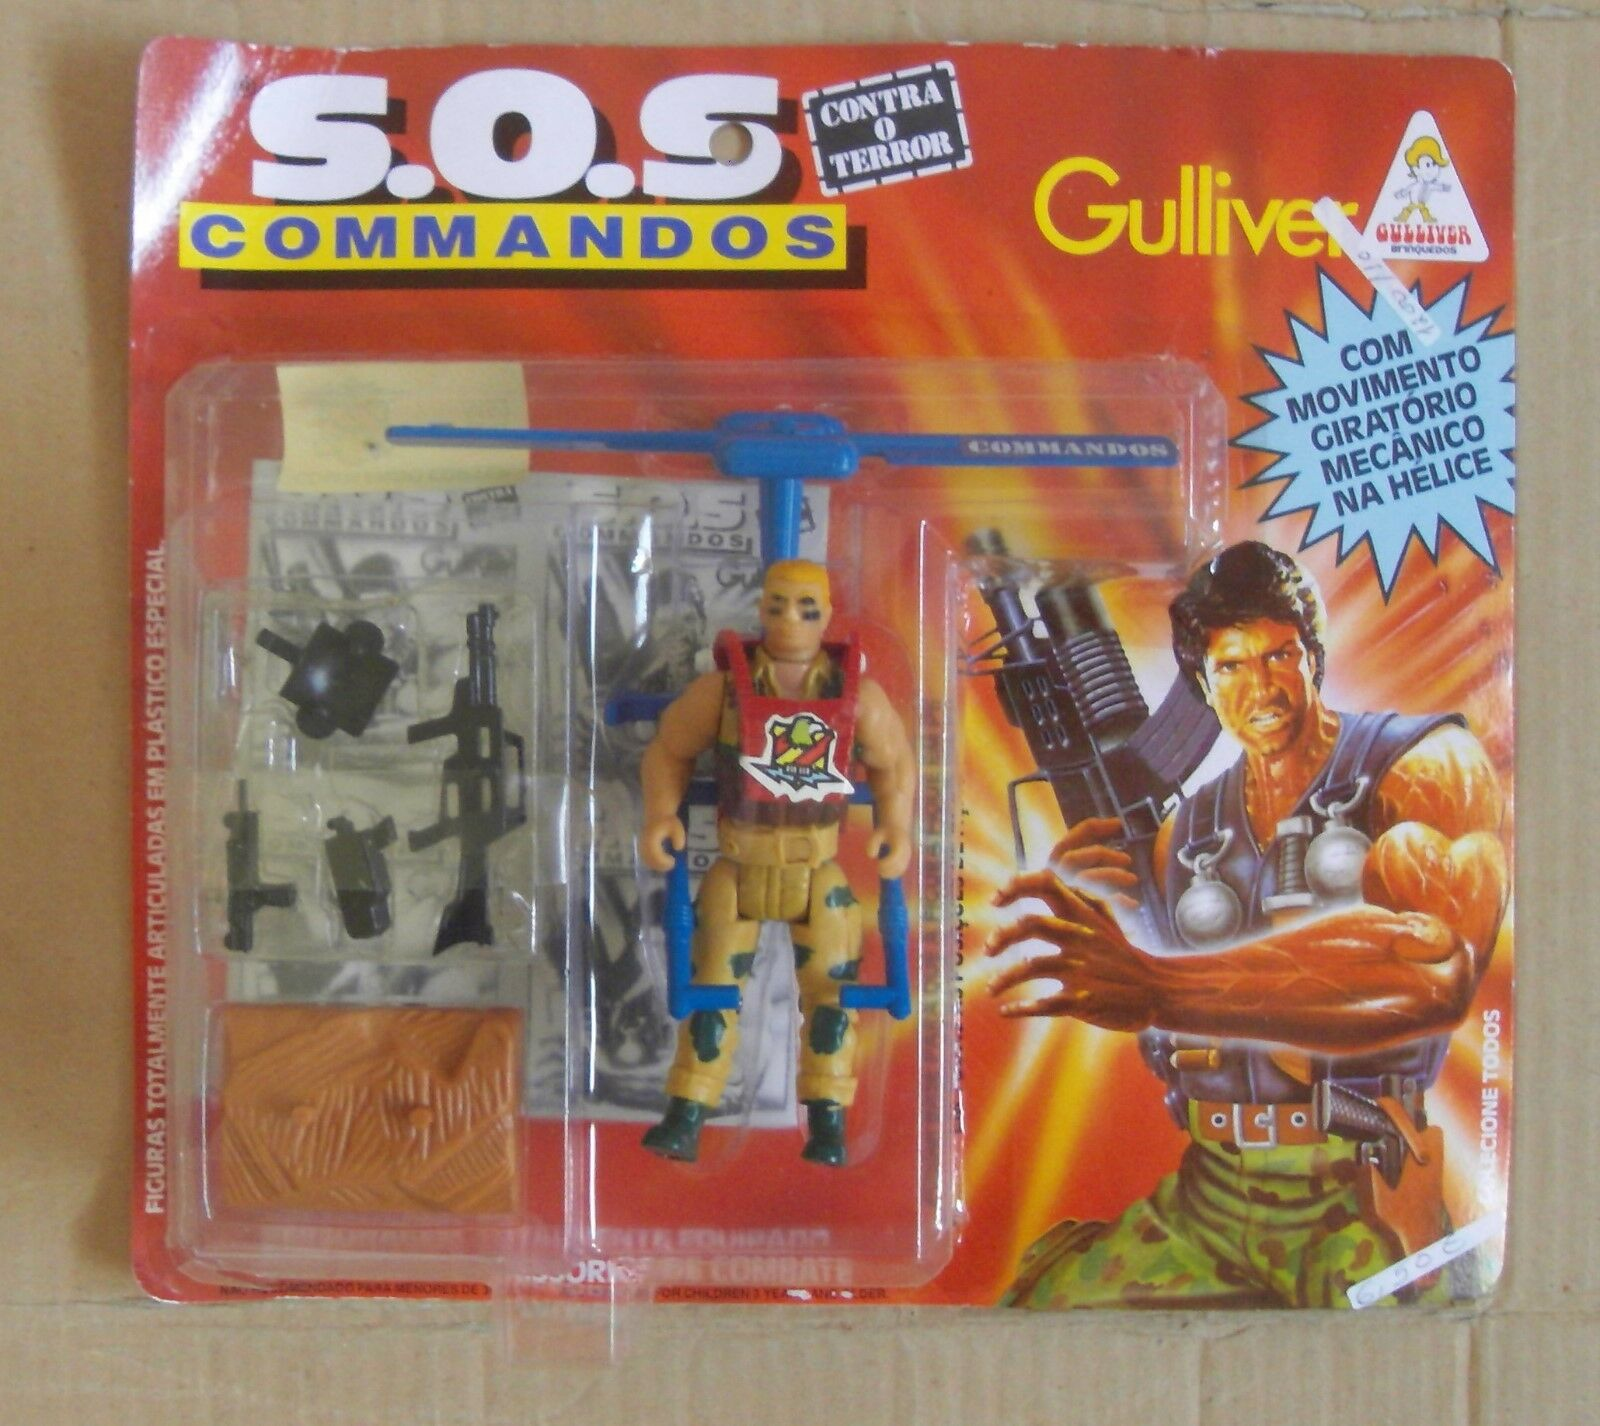 SOS COMMANDOS GULLIVER TOYS COMMANDO COPTER  FIGHTER MILITARY FIGURE PORTUGAL